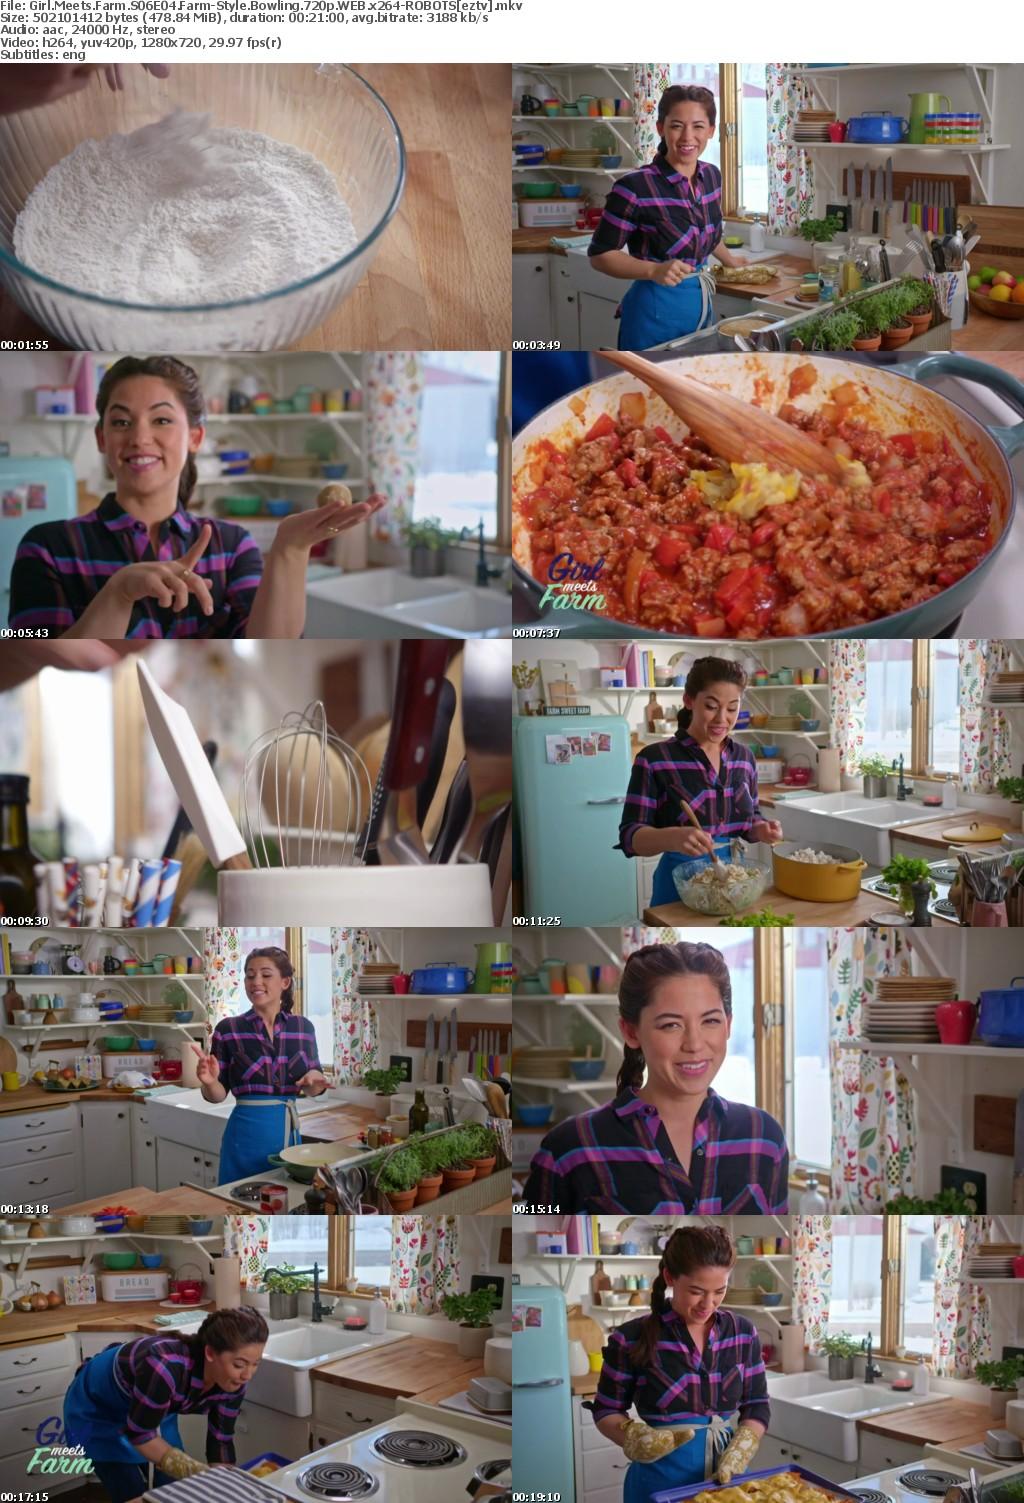 Girl Meets Farm S06E04 Farm-Style Bowling 720p WEB x264-ROBOTS